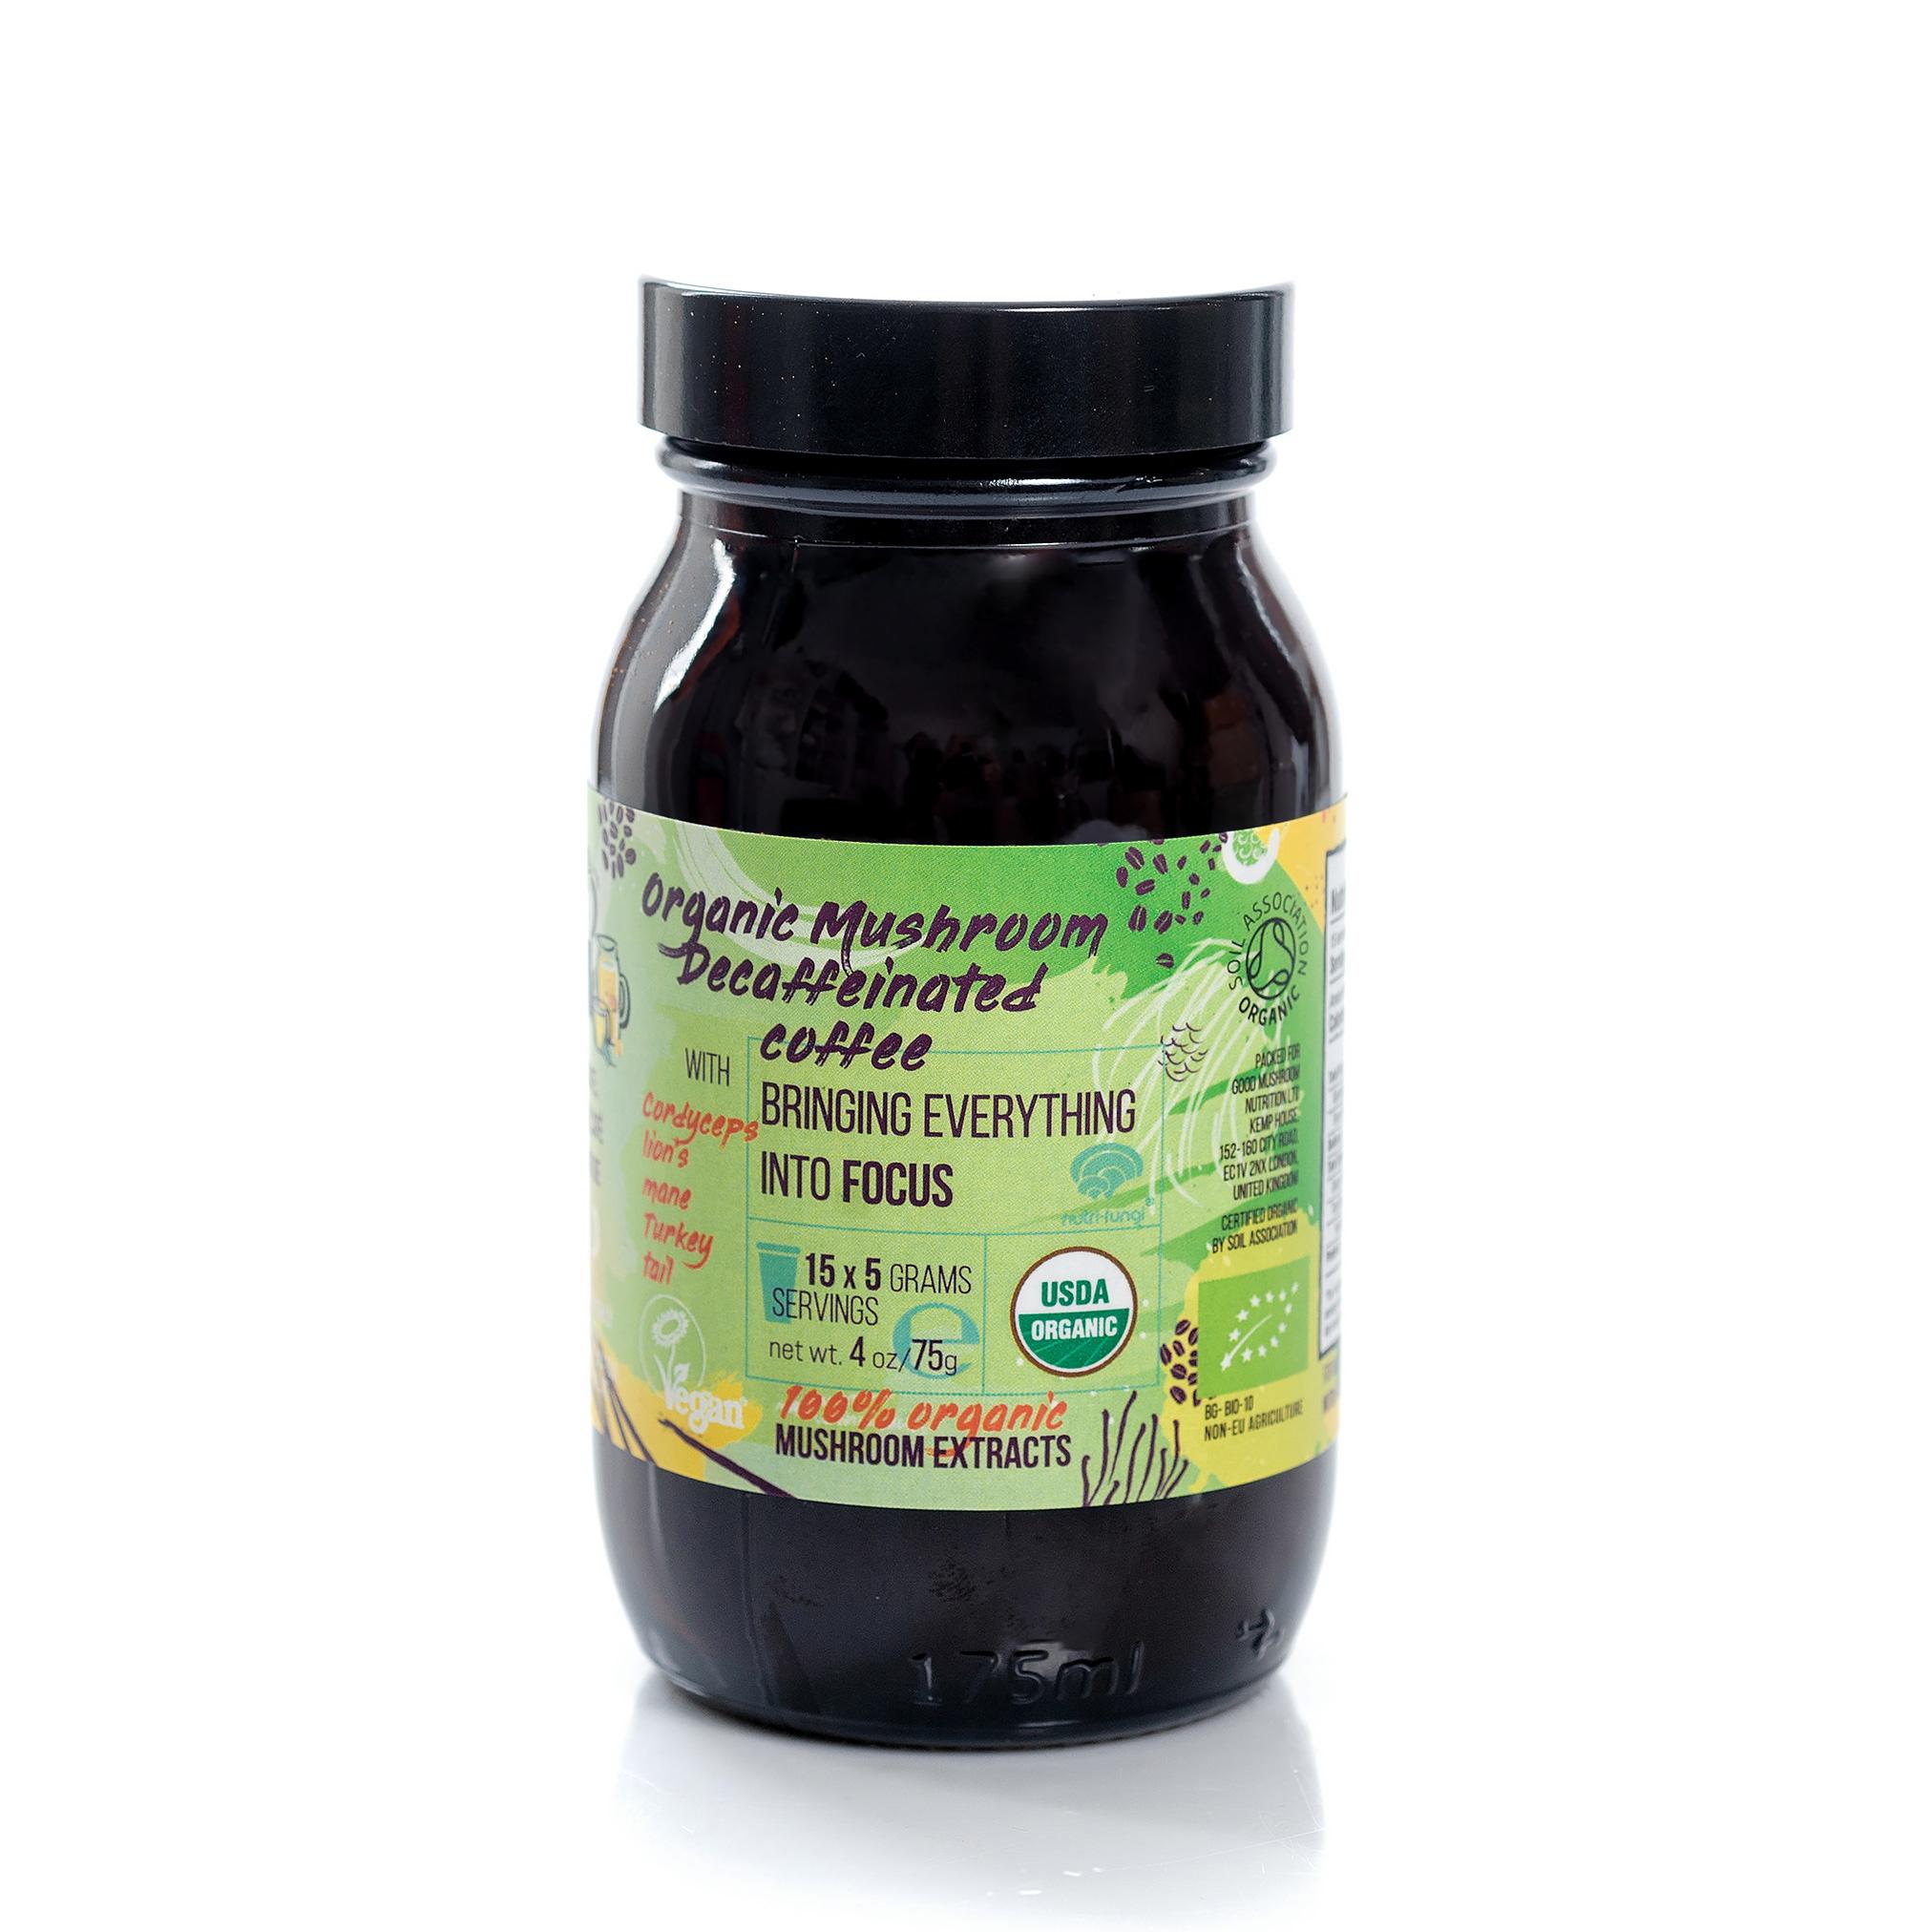 Organic Mushroom Decaffeinated Coffee, Bringing Everything Into Focus 75g